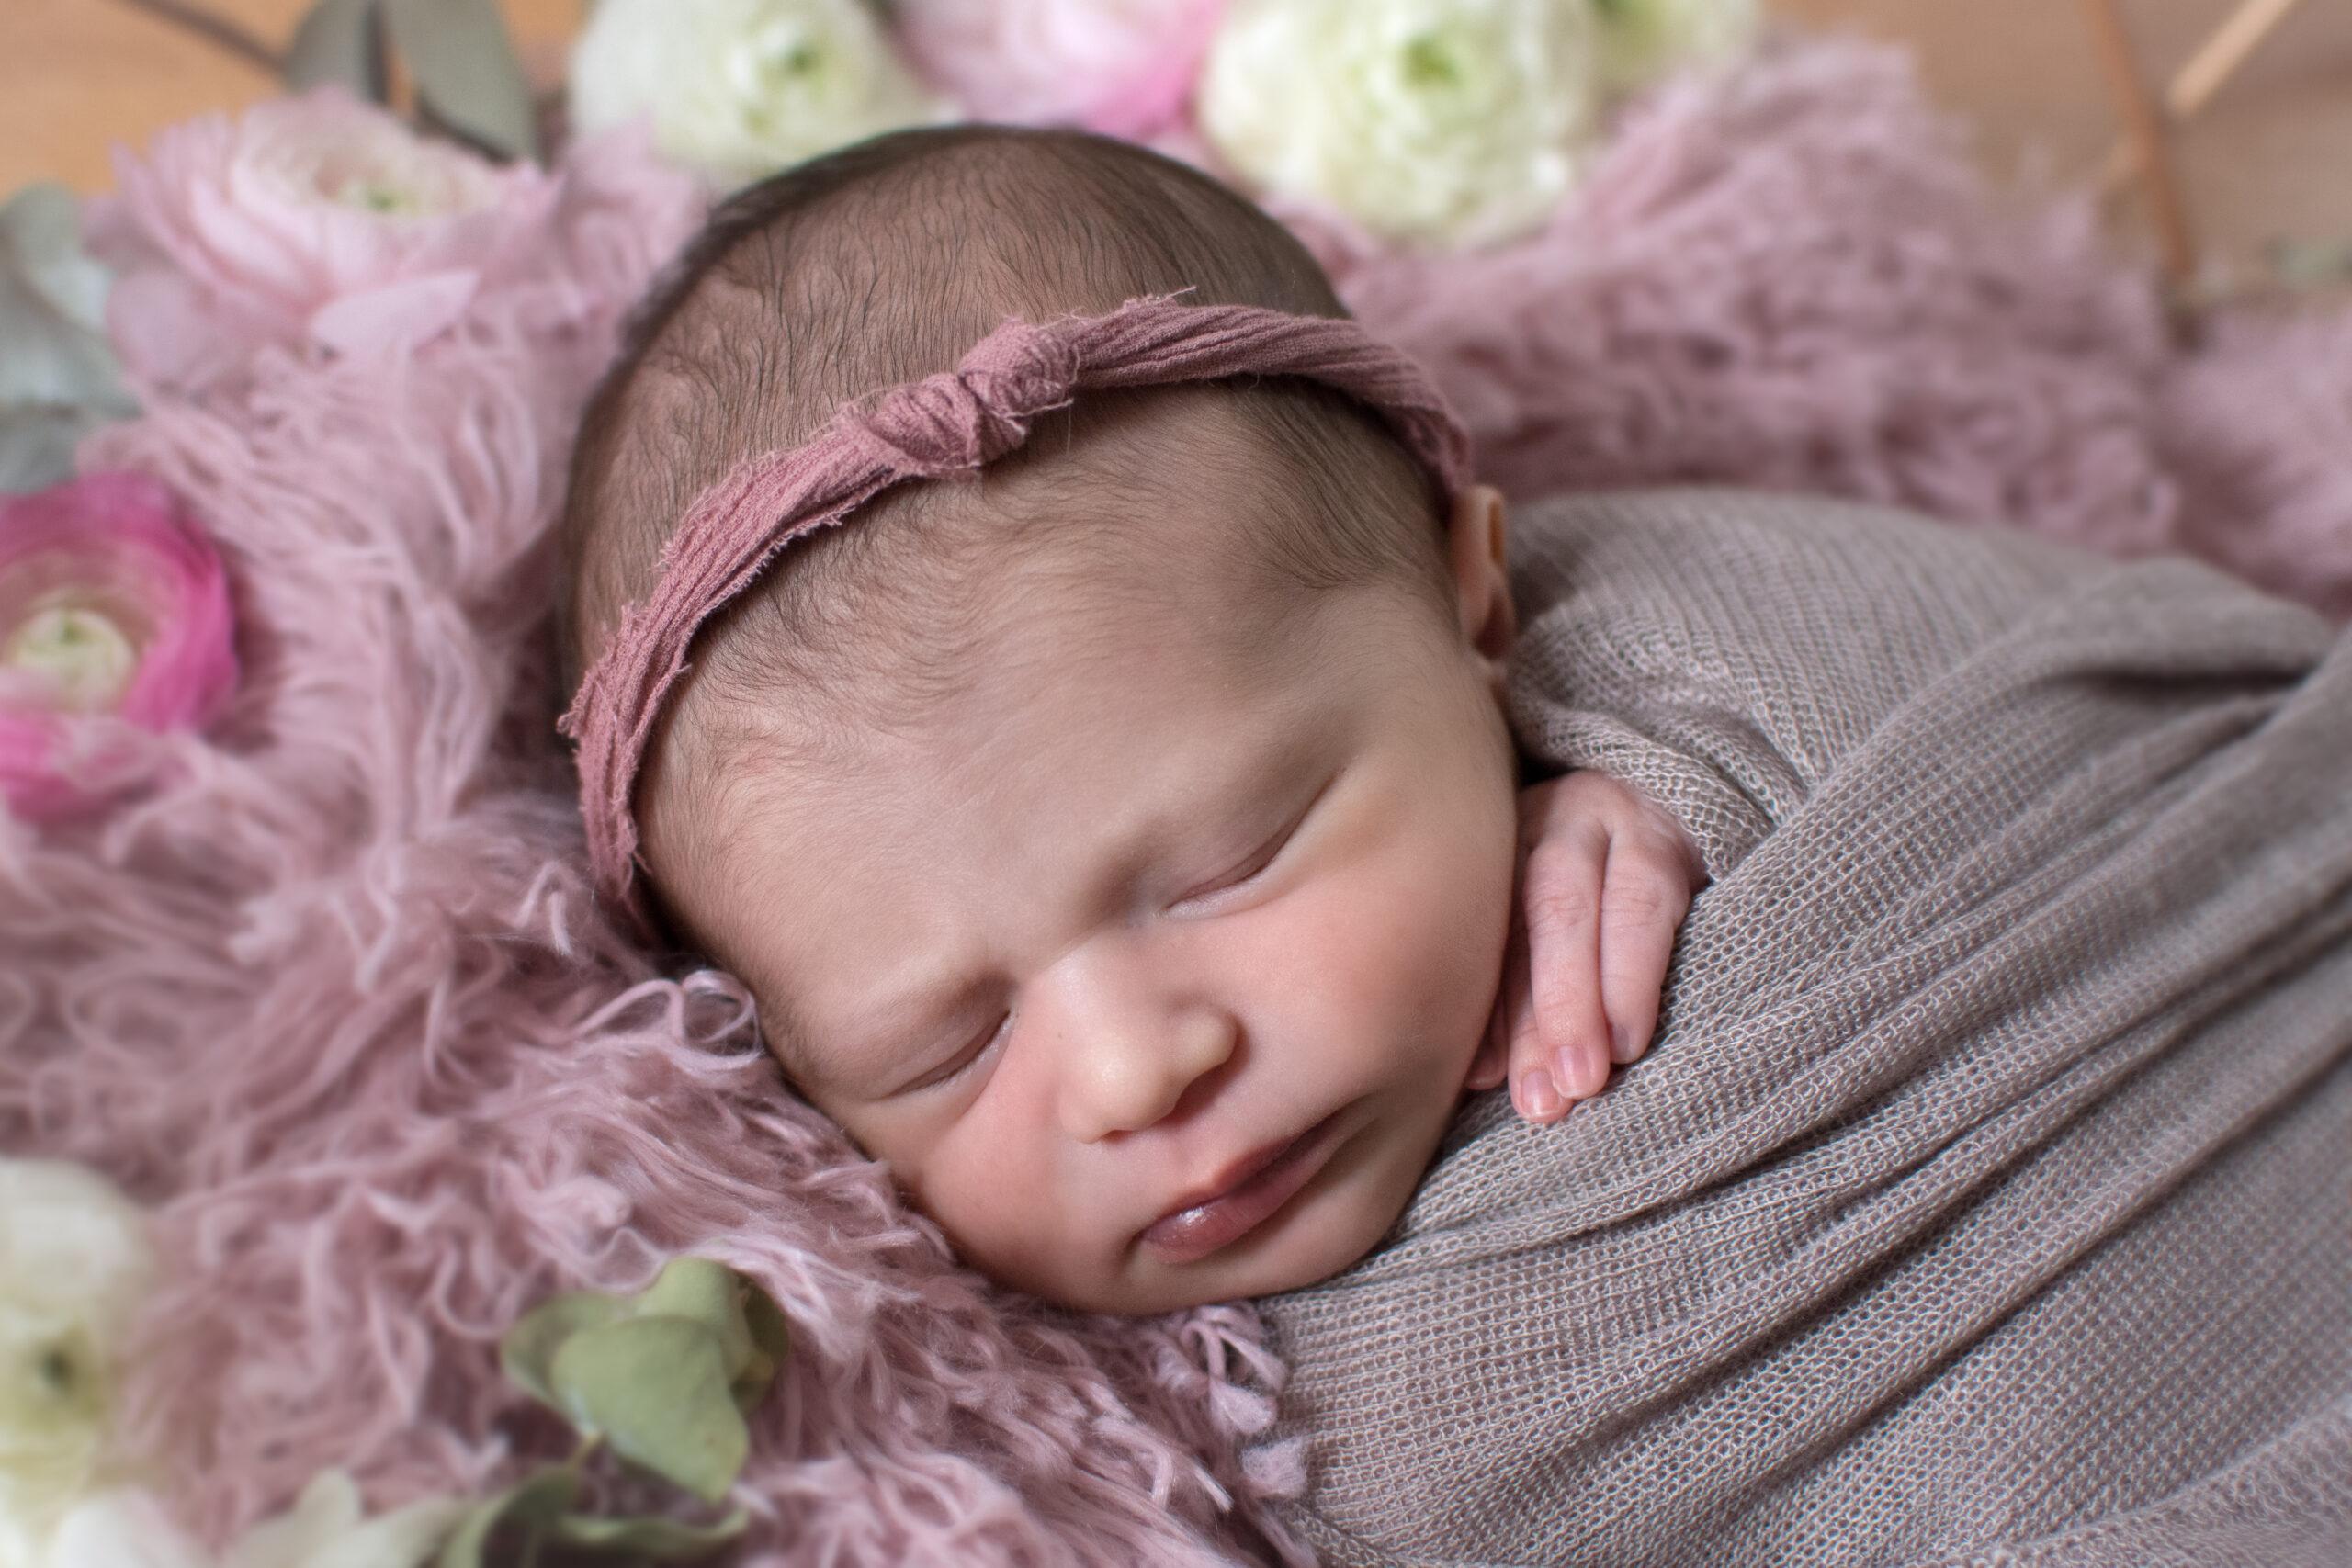 San Diego Newborn Photographer   Baby Photos La Jolla